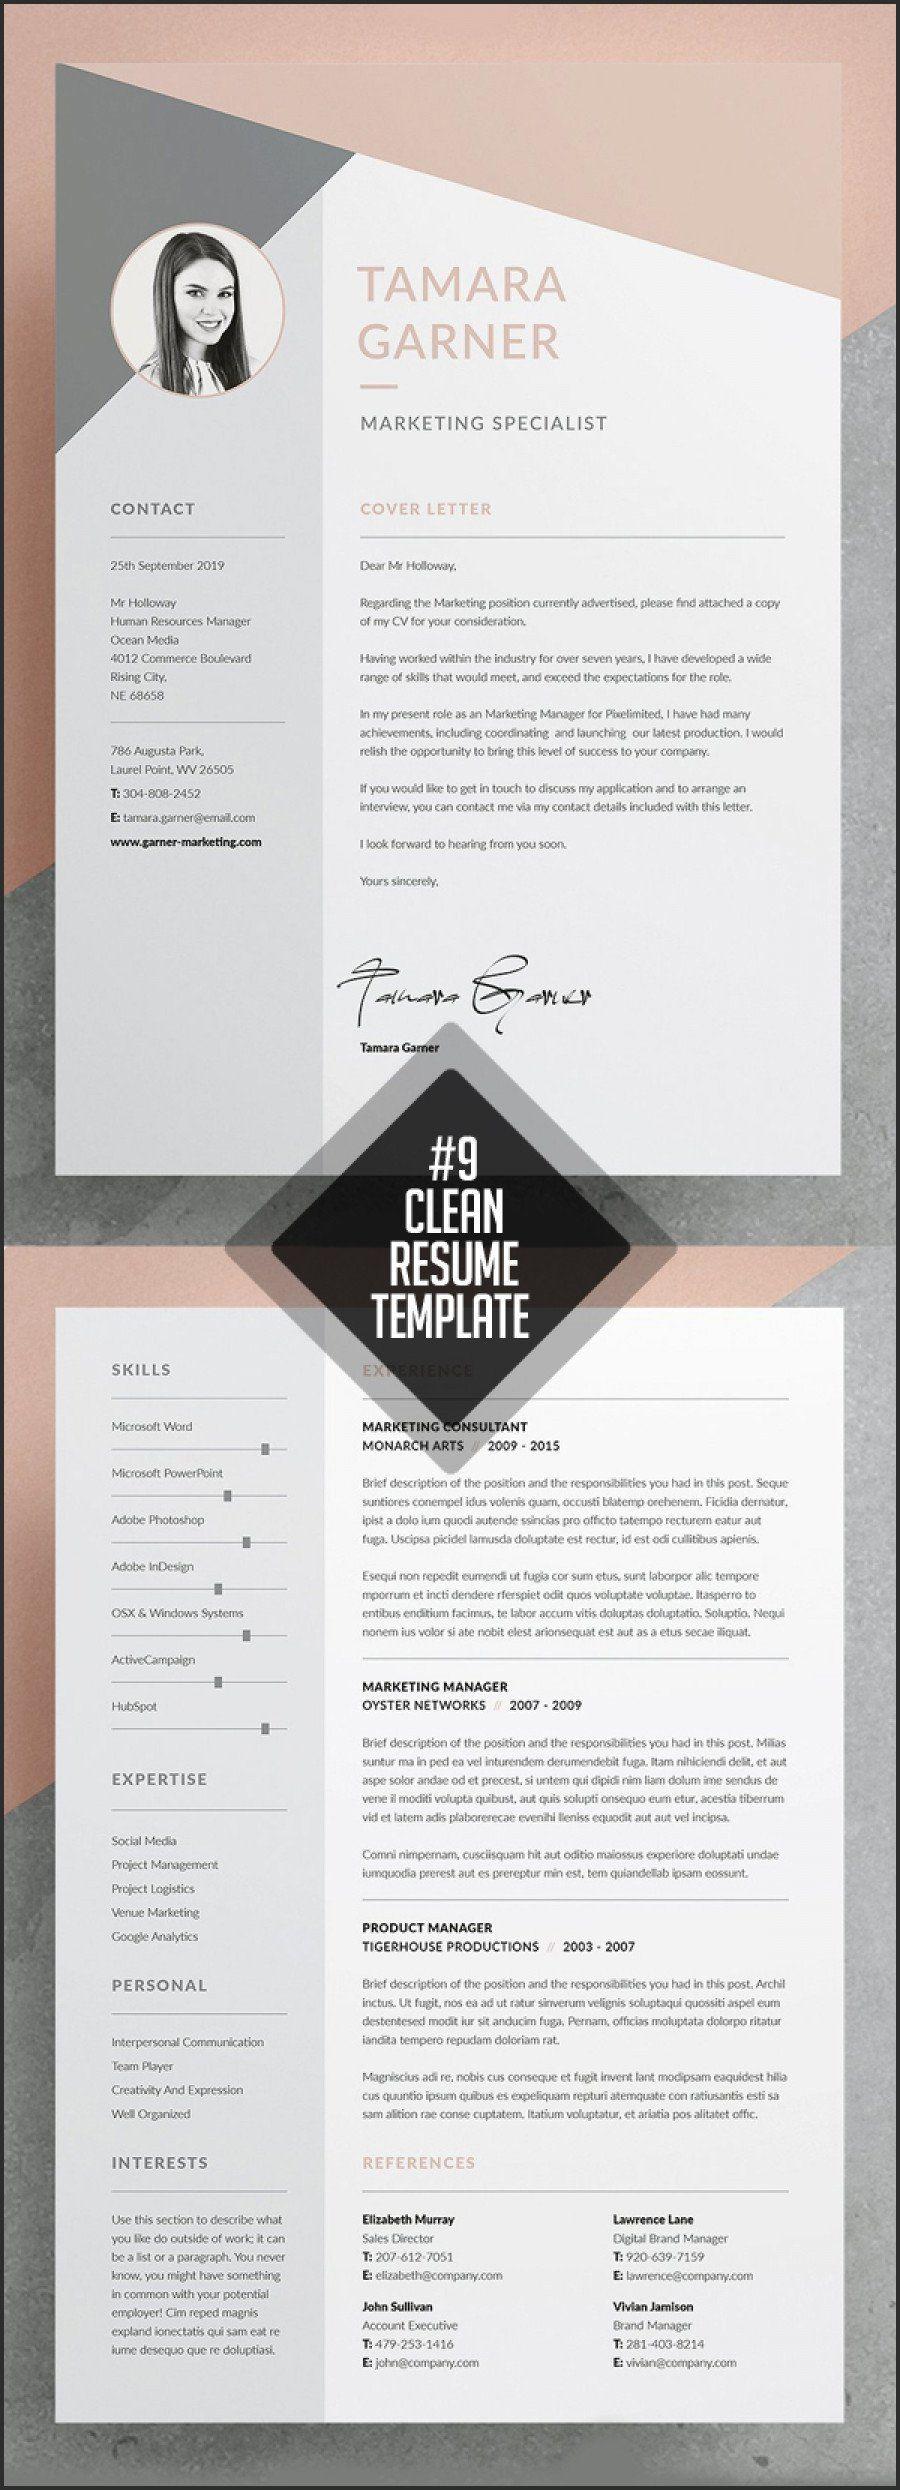 Adobe indesign resume template best of adobe indesign